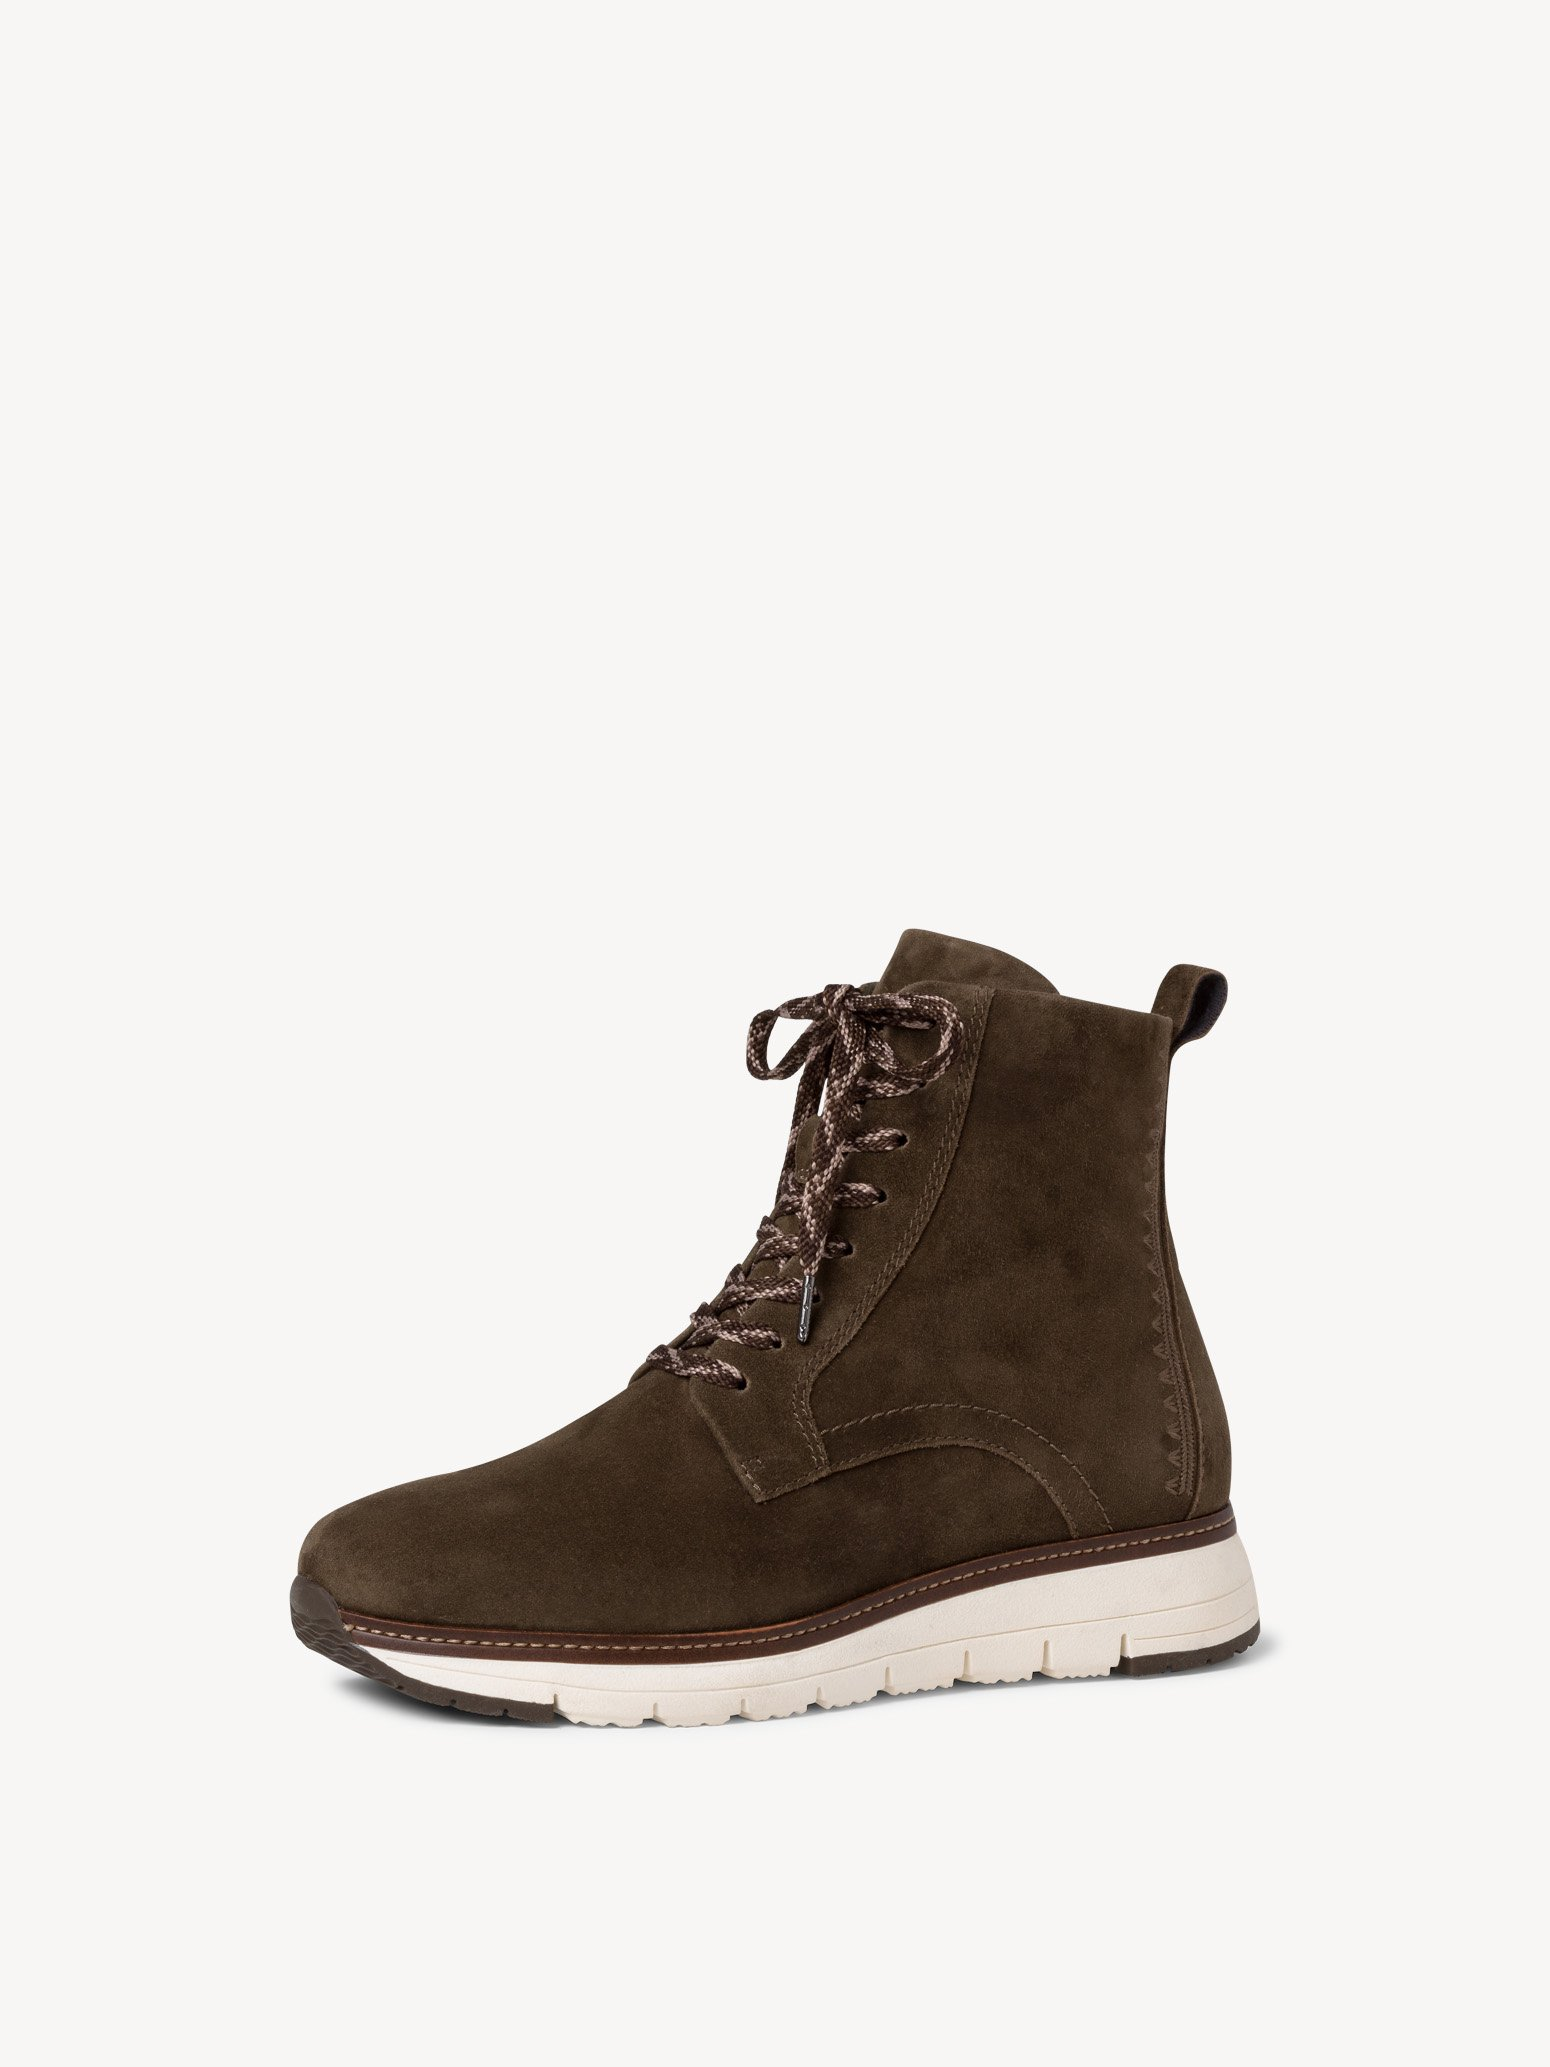 Ботинки Tamaris 1-1-25256-25-722